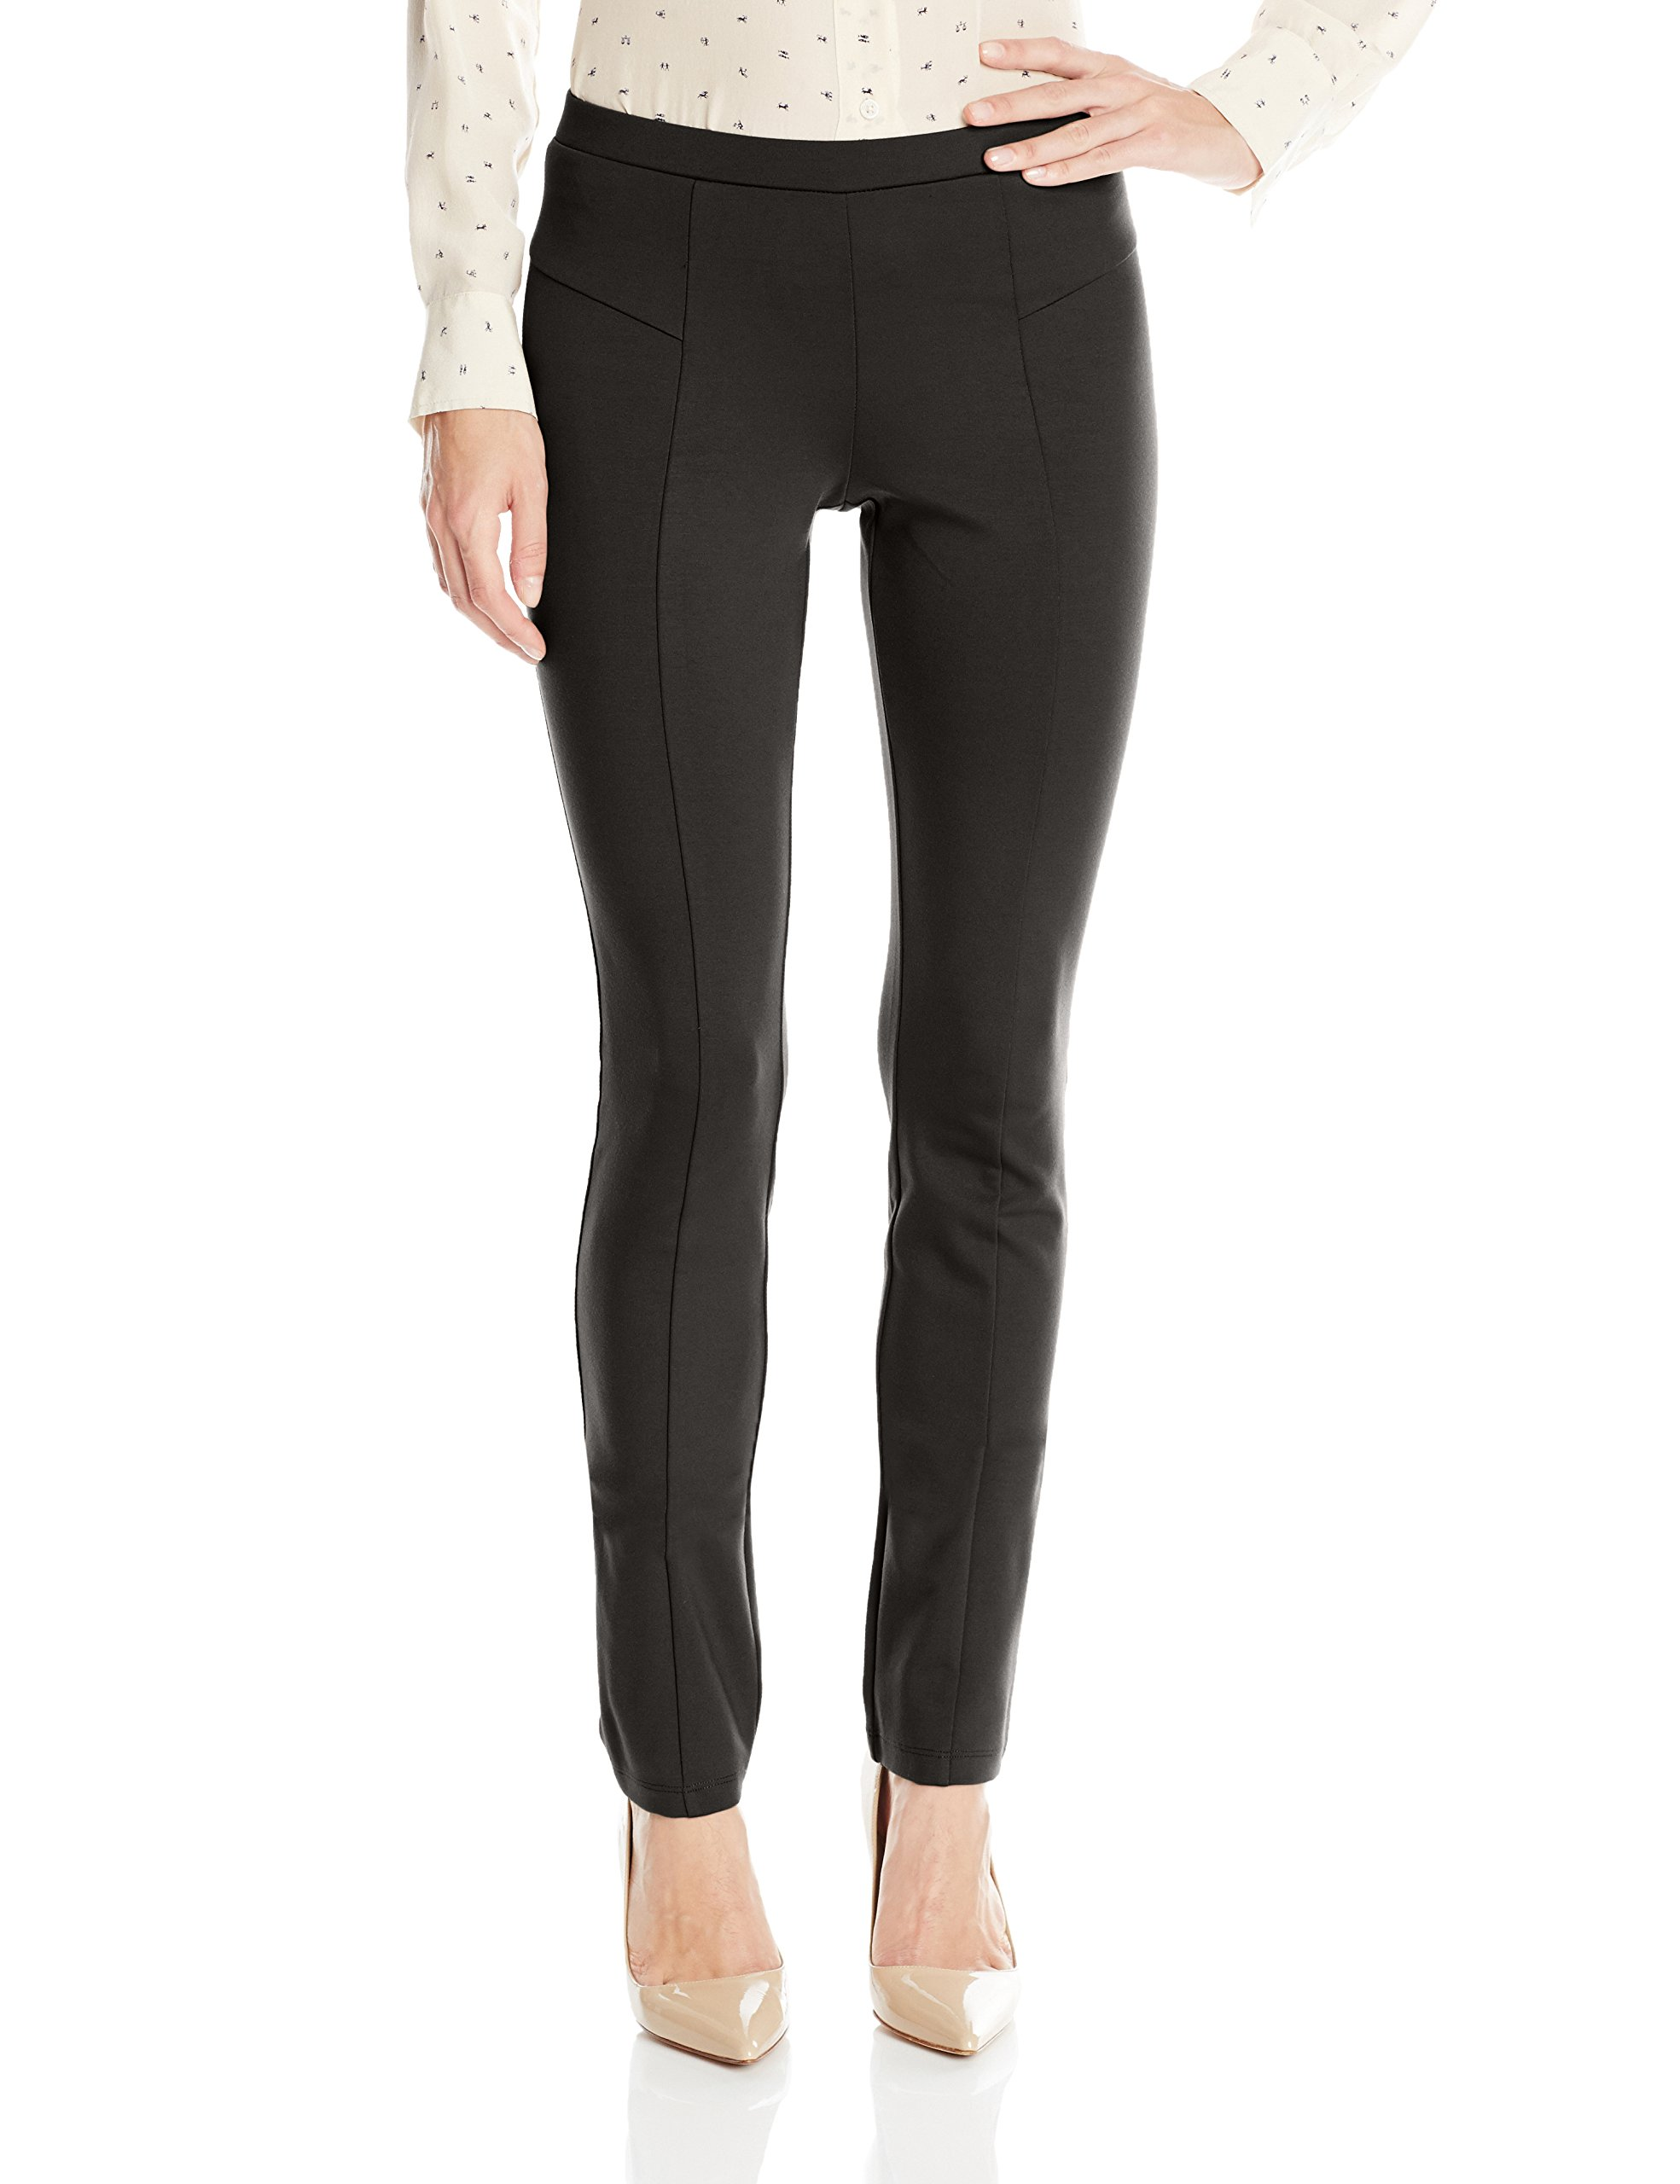 NIC+ZOE Women's Perfect Ponte Pant, Black Onyx, Small